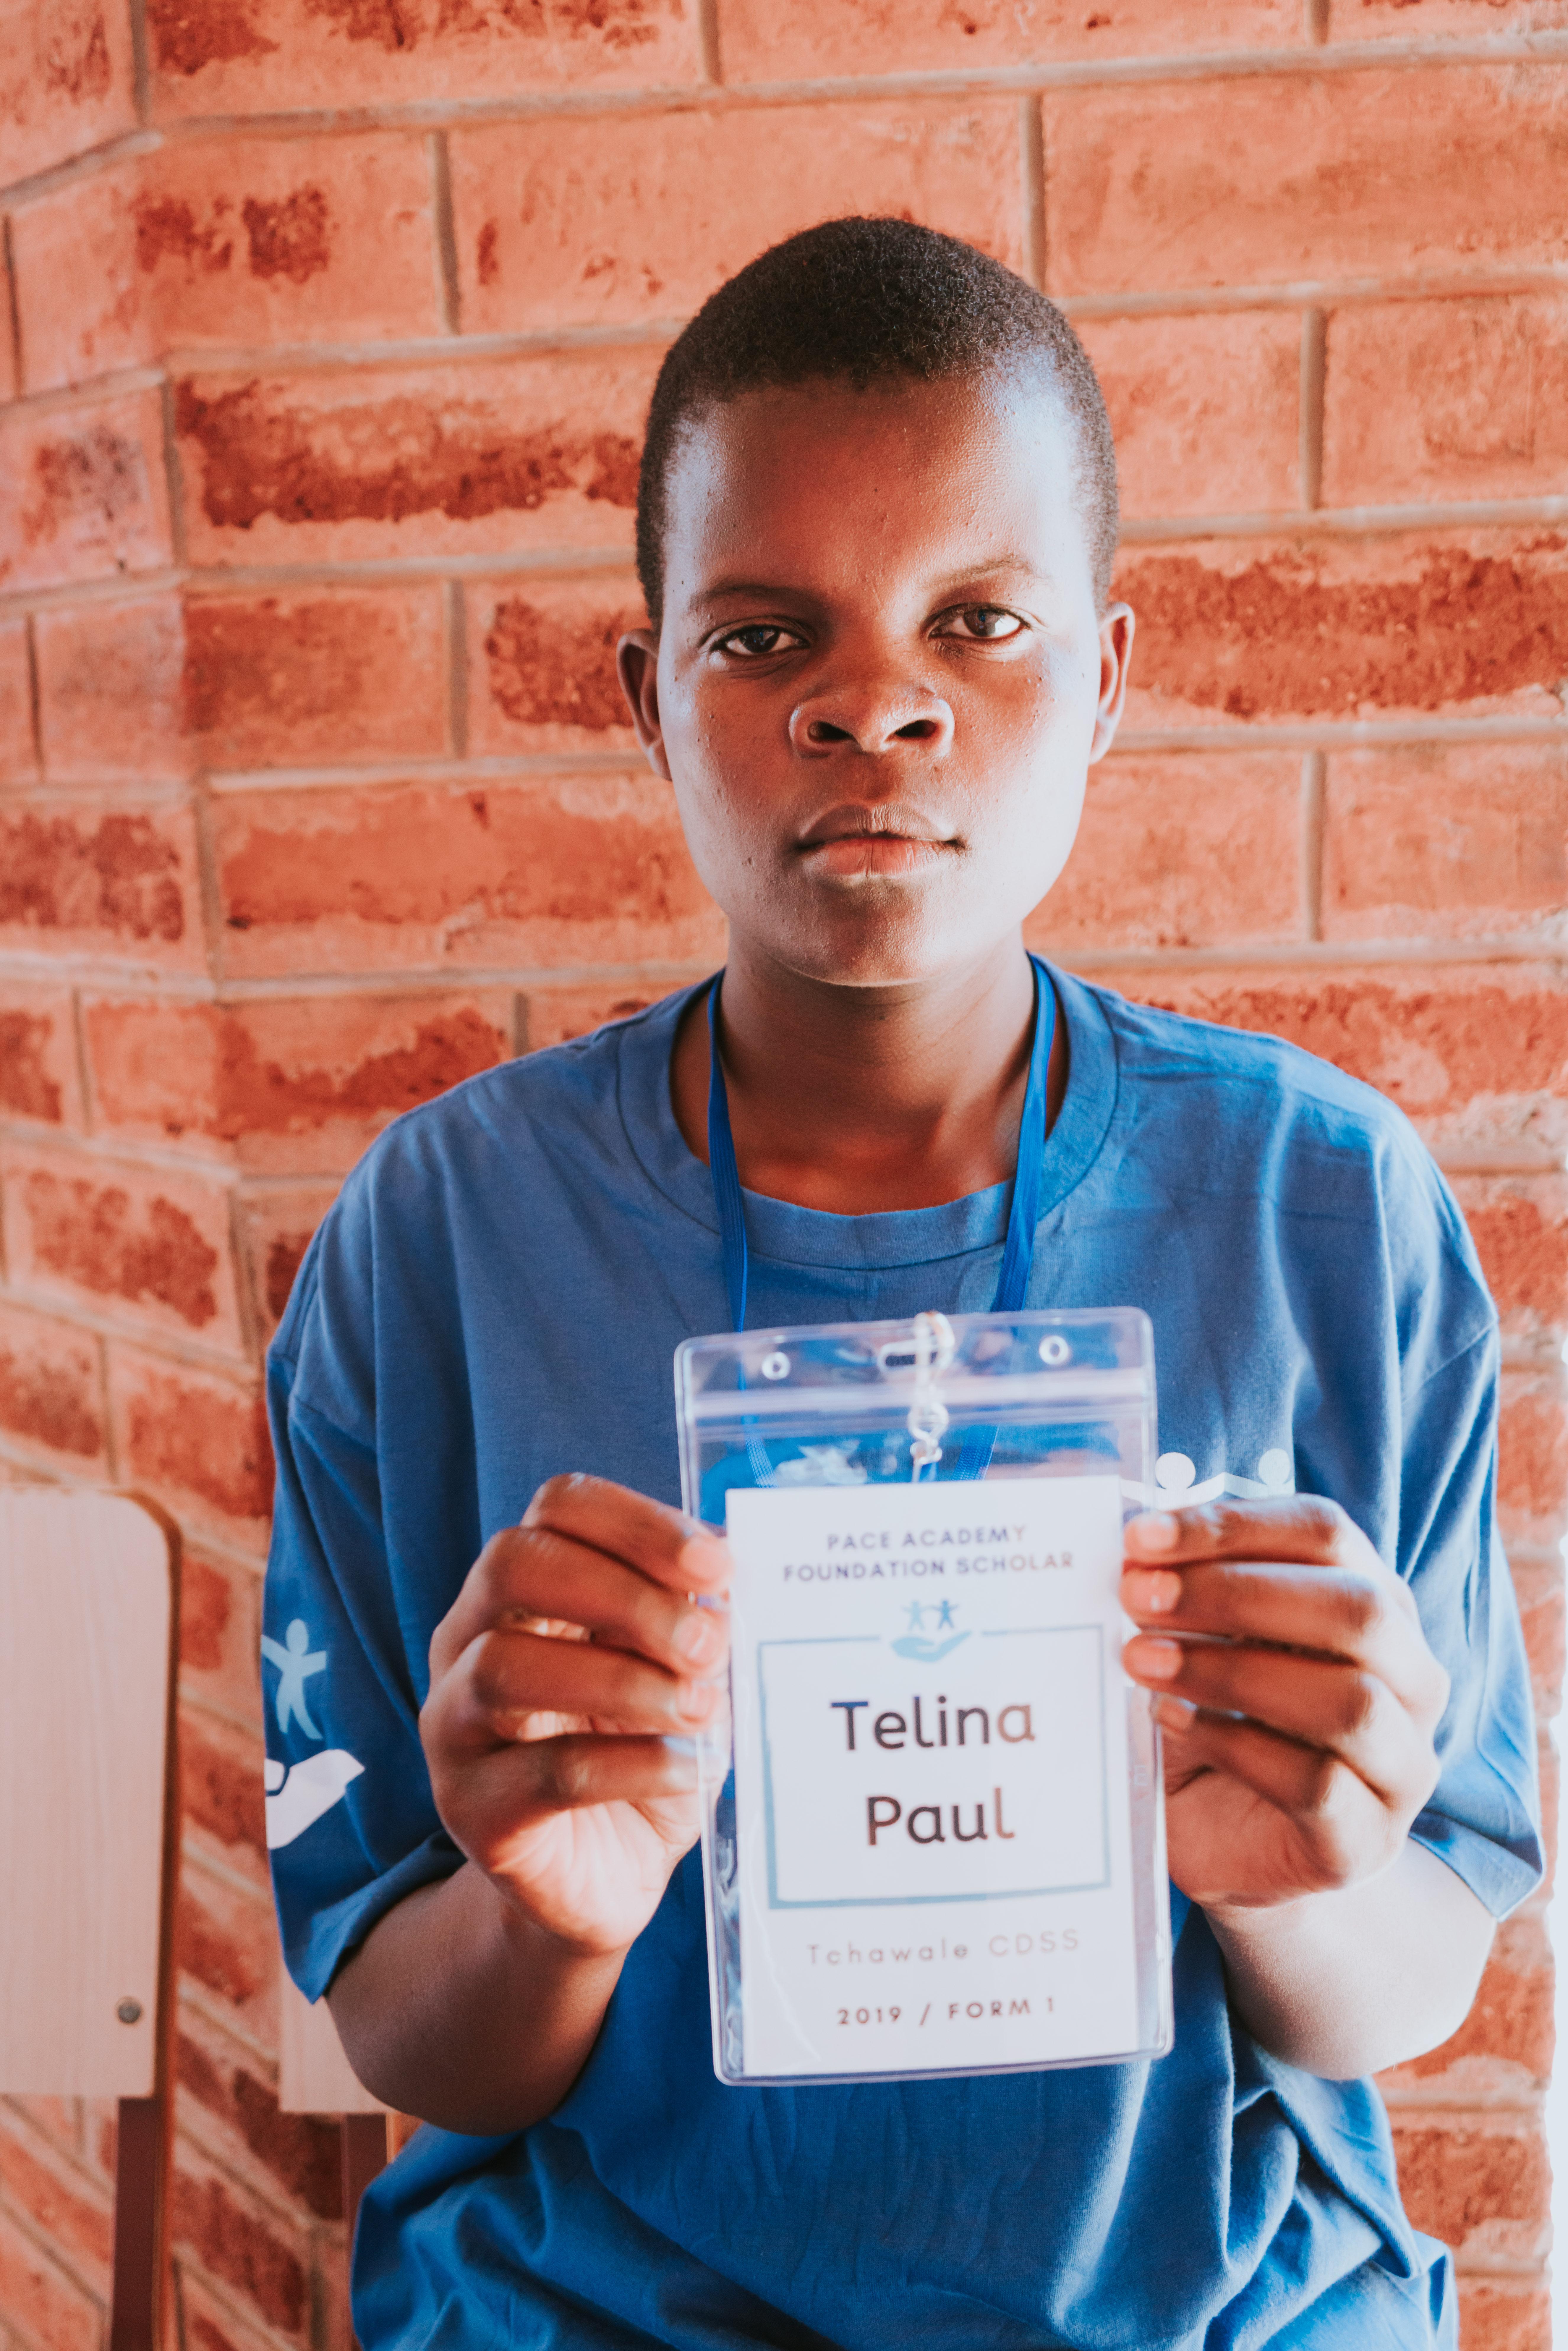 Telina Paul (Tchawale CDSS)